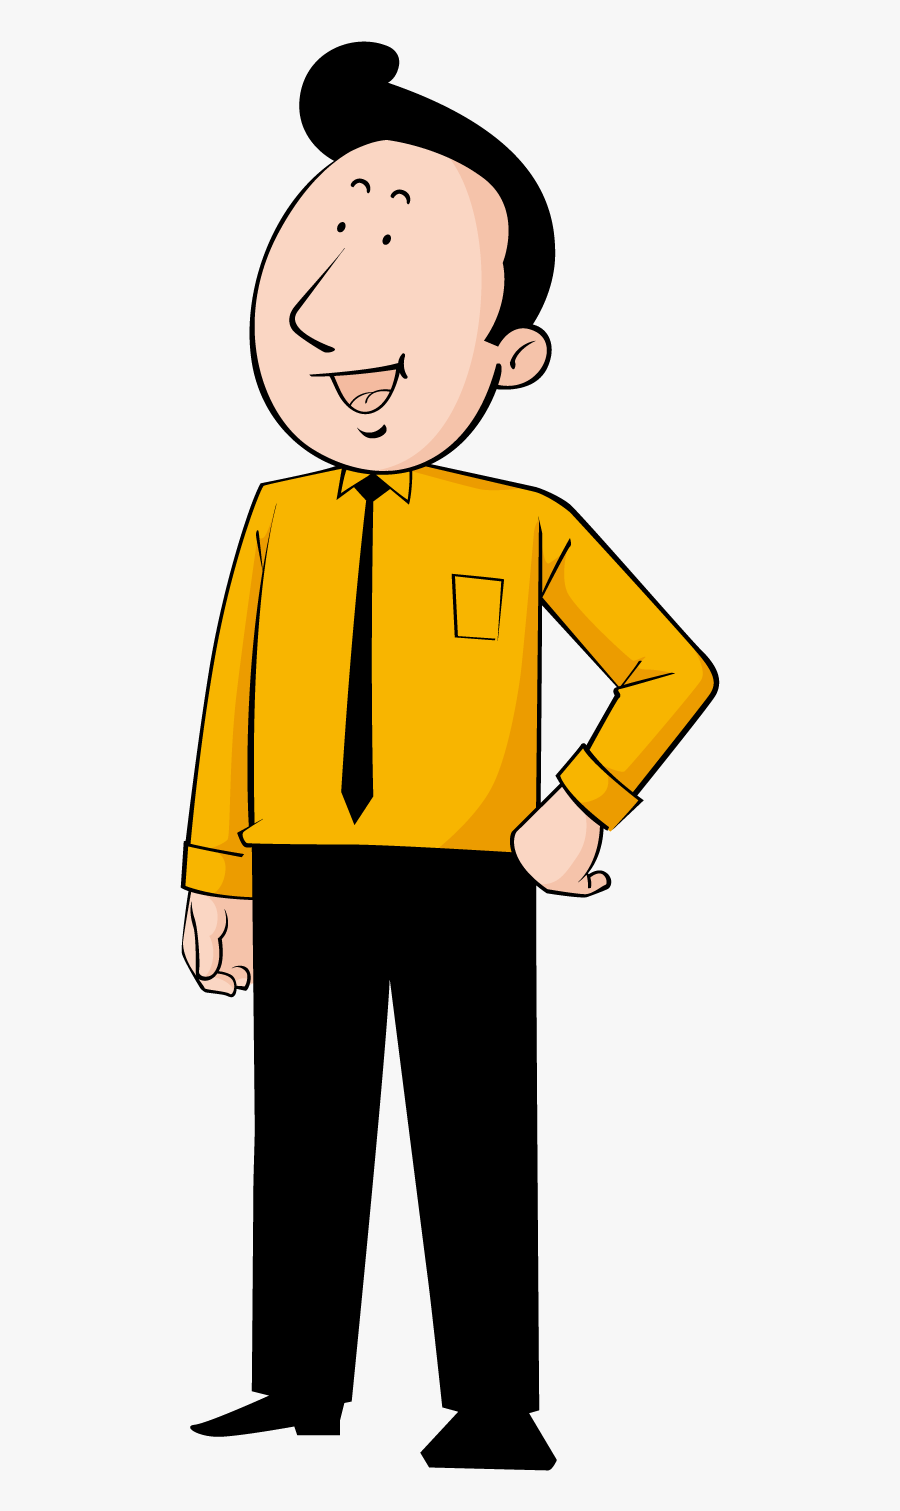 Happy Man Png Download - Transparent Cartoon Person Happy, Transparent Clipart